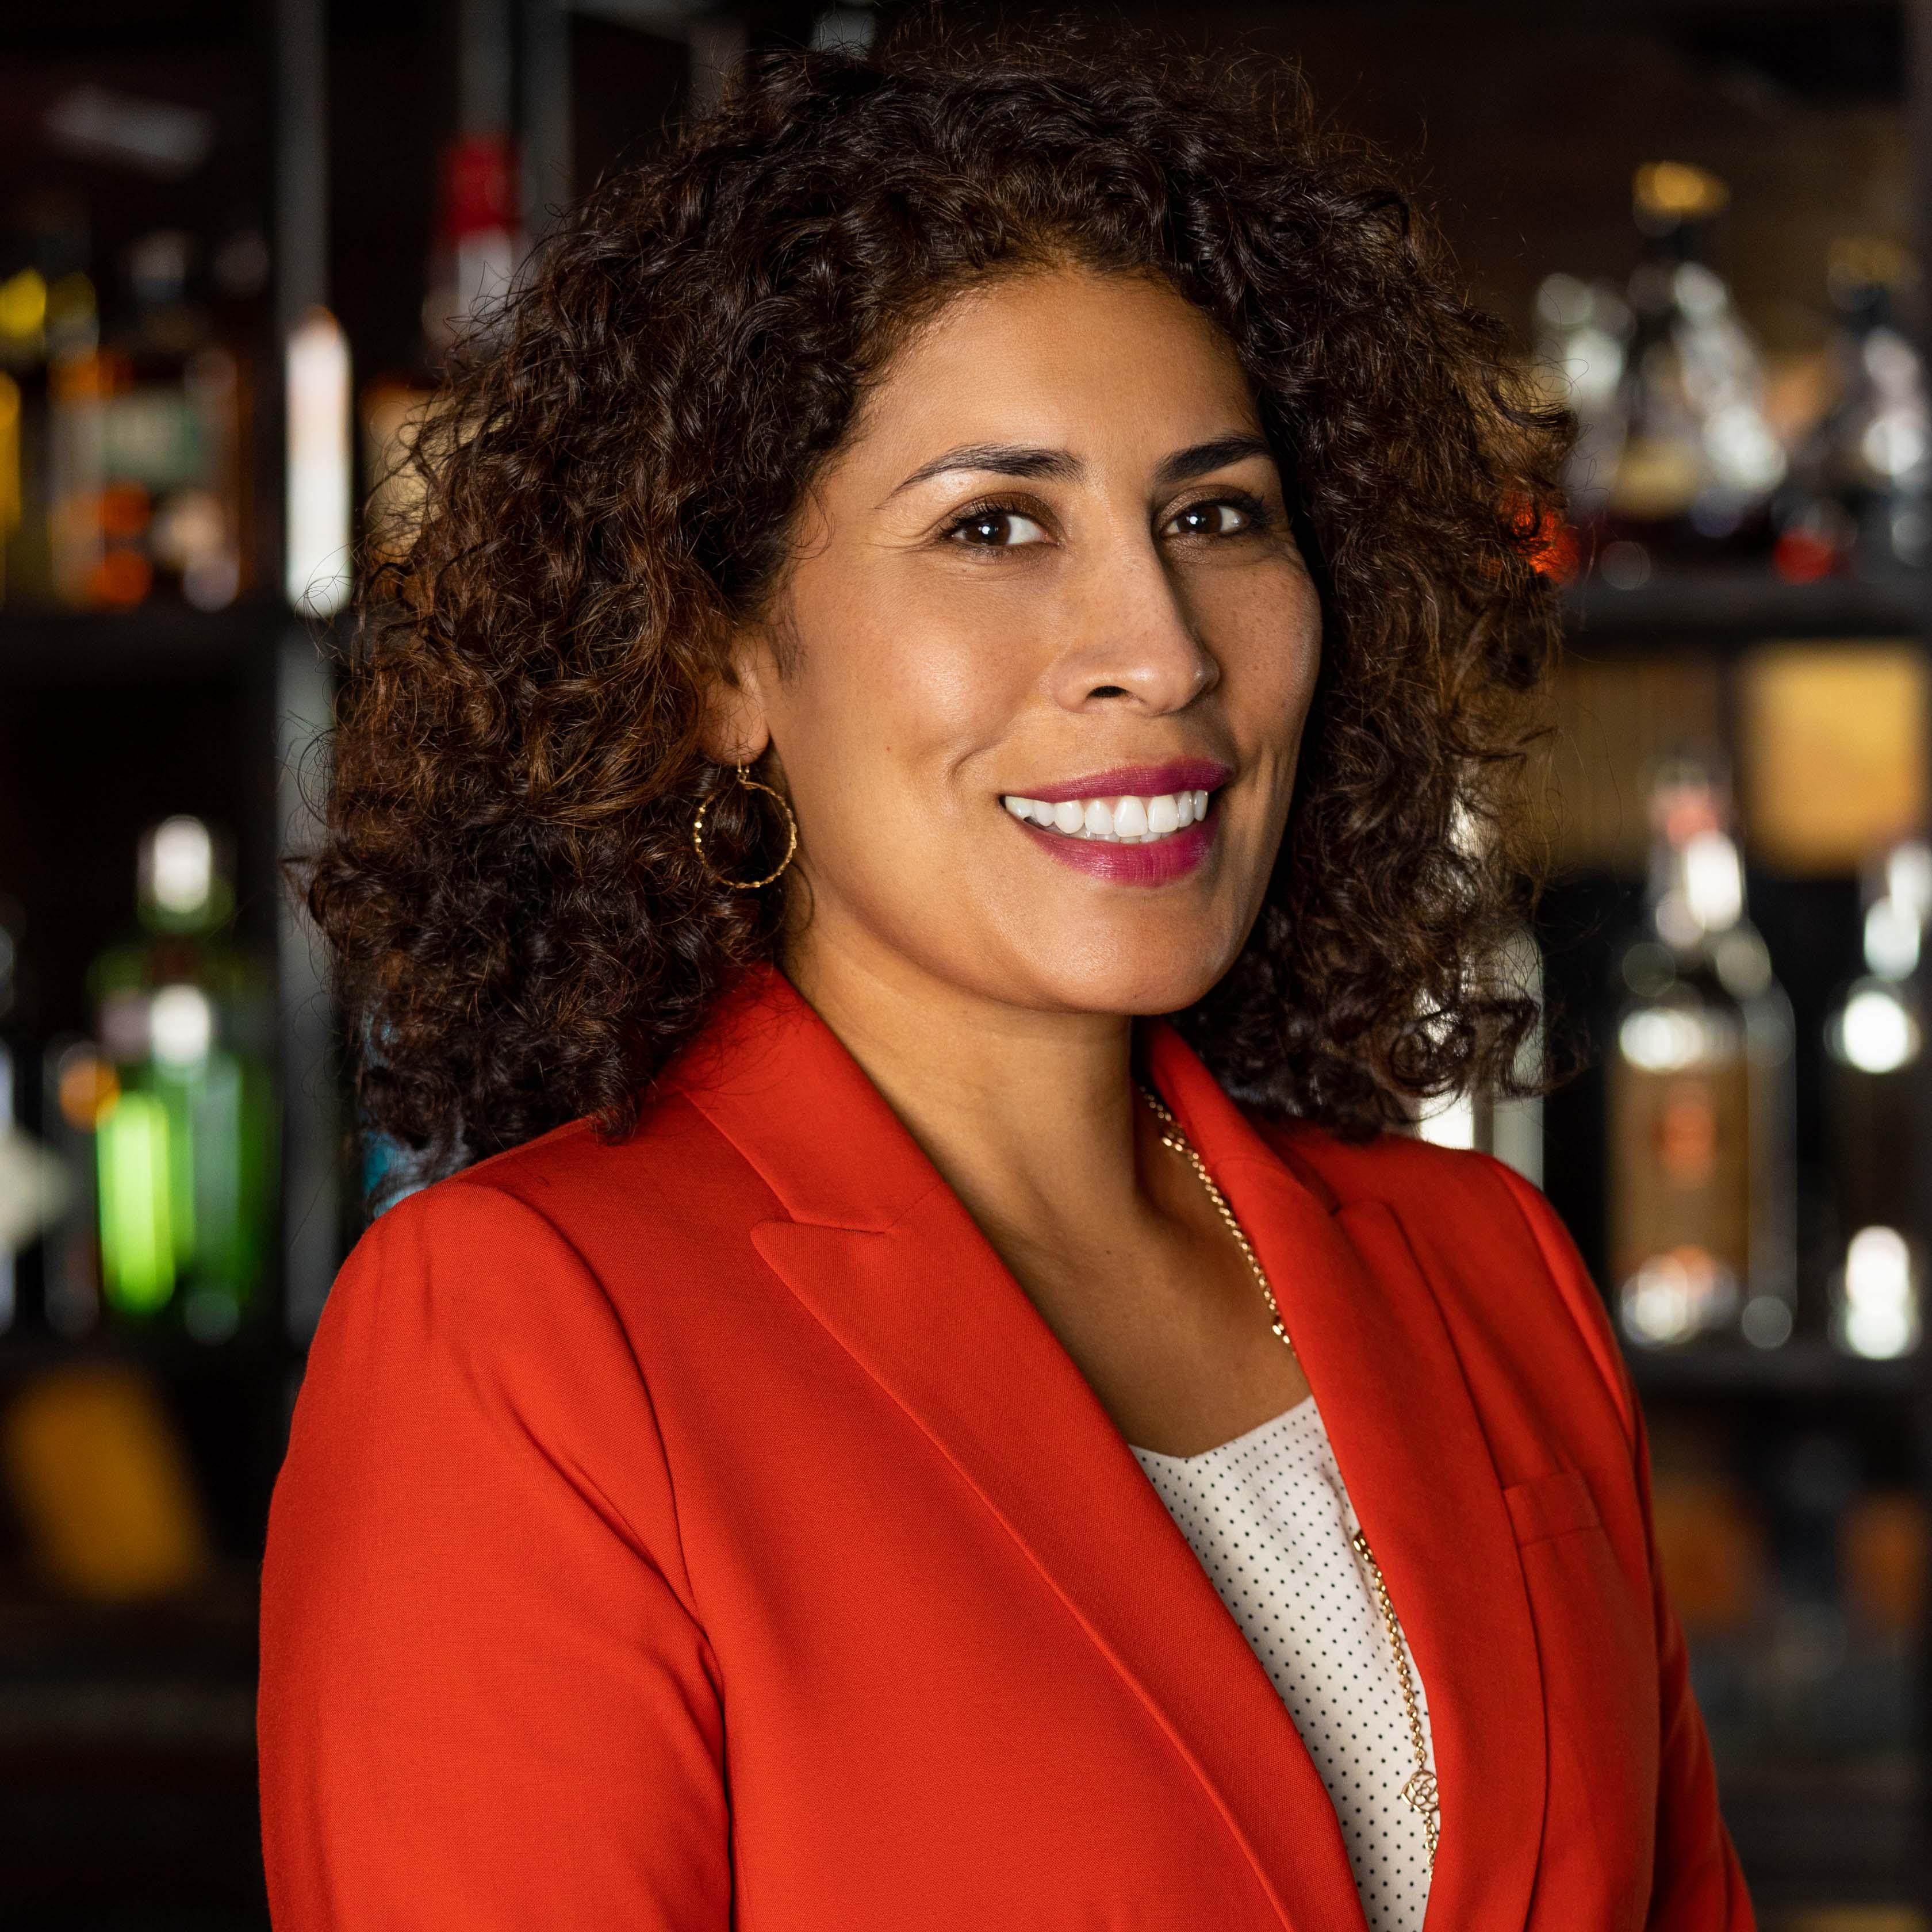 April Alejandro - Vice President, SMBD Multicultural Marketing, Southern Glazer's Wine & Spirits